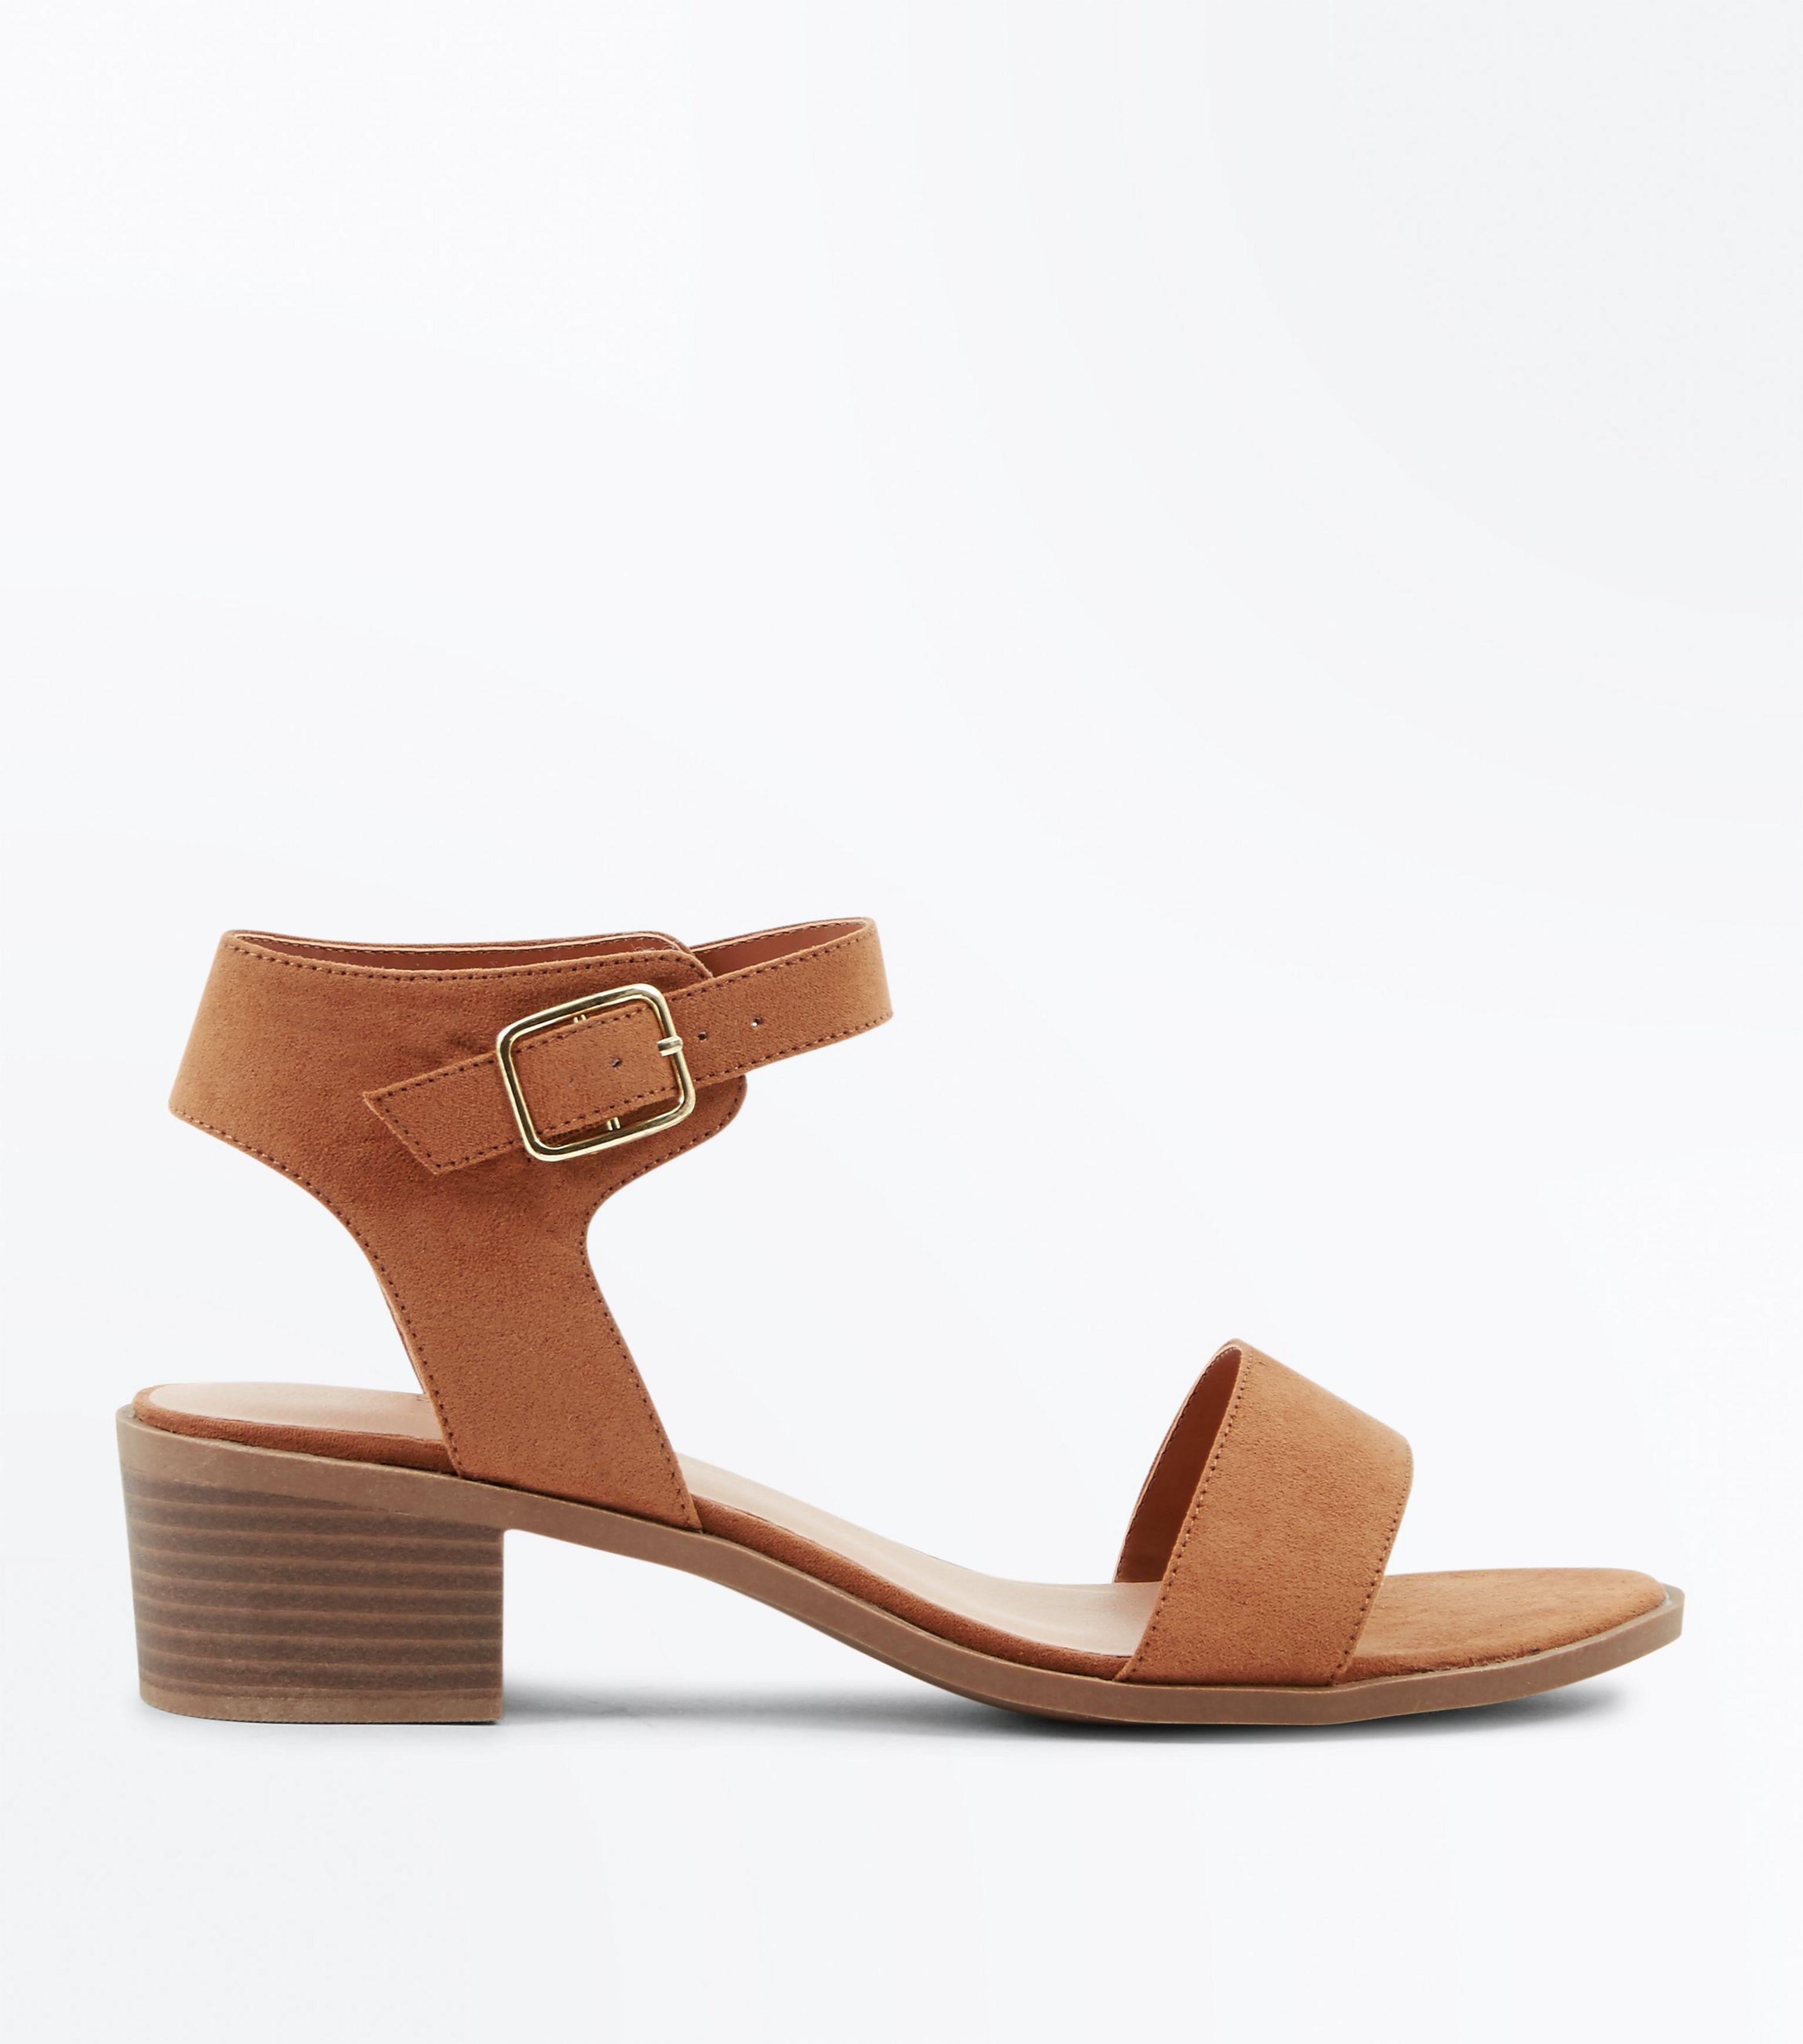 b2bc843d711 New Look Wide Fit Tan Suedette Low Block Heel Sandals in Brown - Lyst